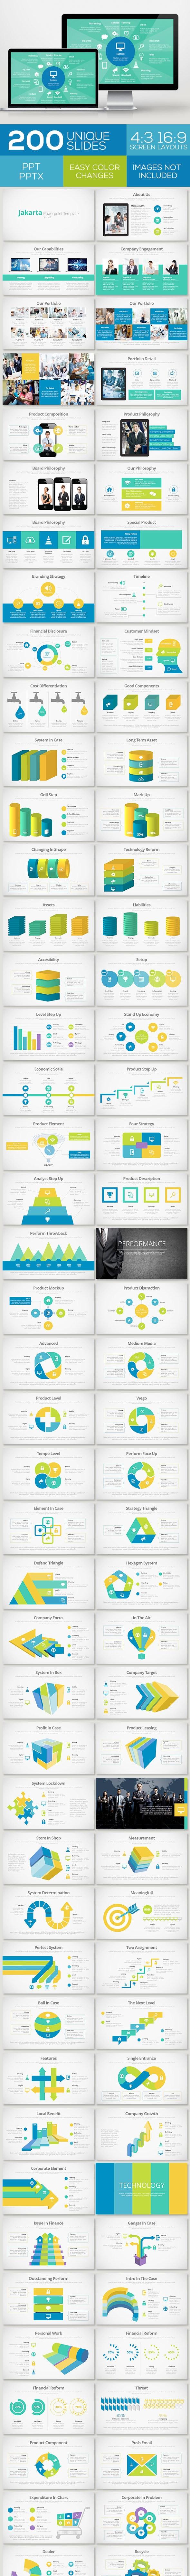 Jakarta Powerpoint Template Volume 3 - Business PowerPoint Templates